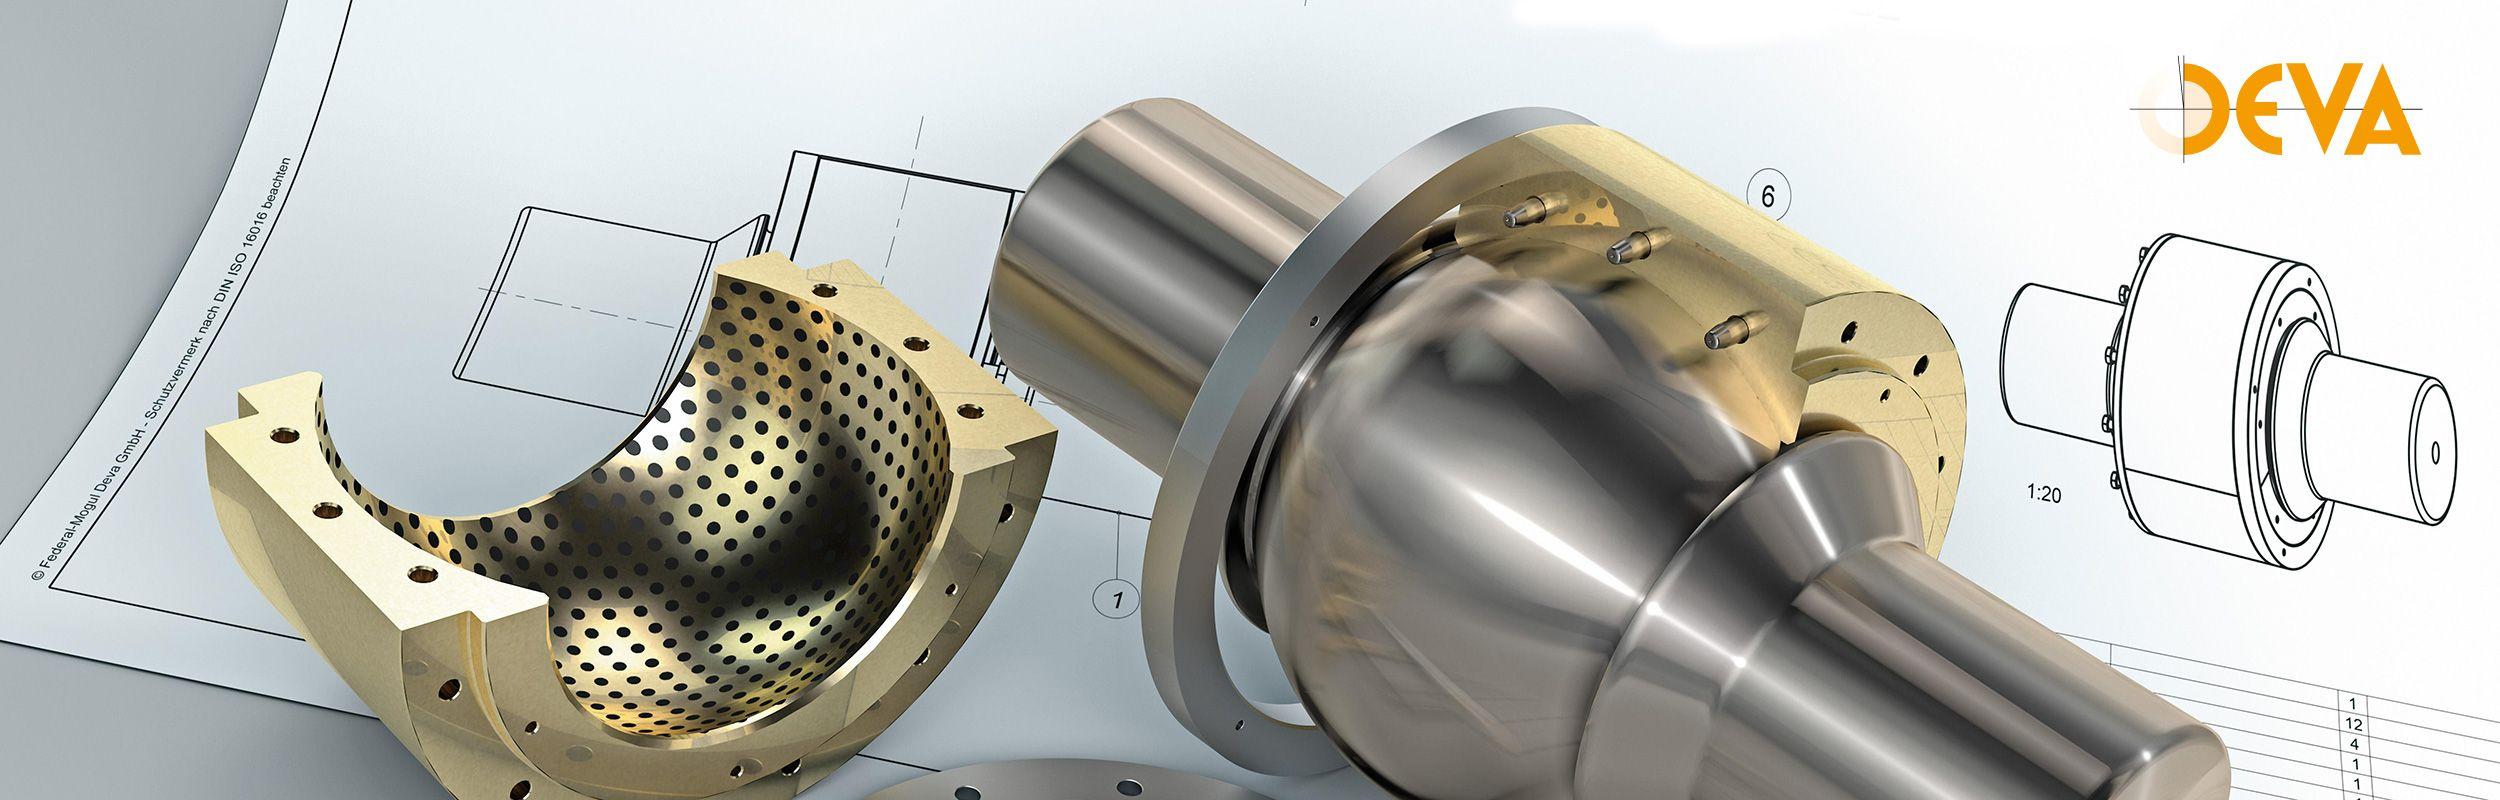 DEVA_Self-lubricating_bearings_maintenance-free_sliding_bearings_slider1